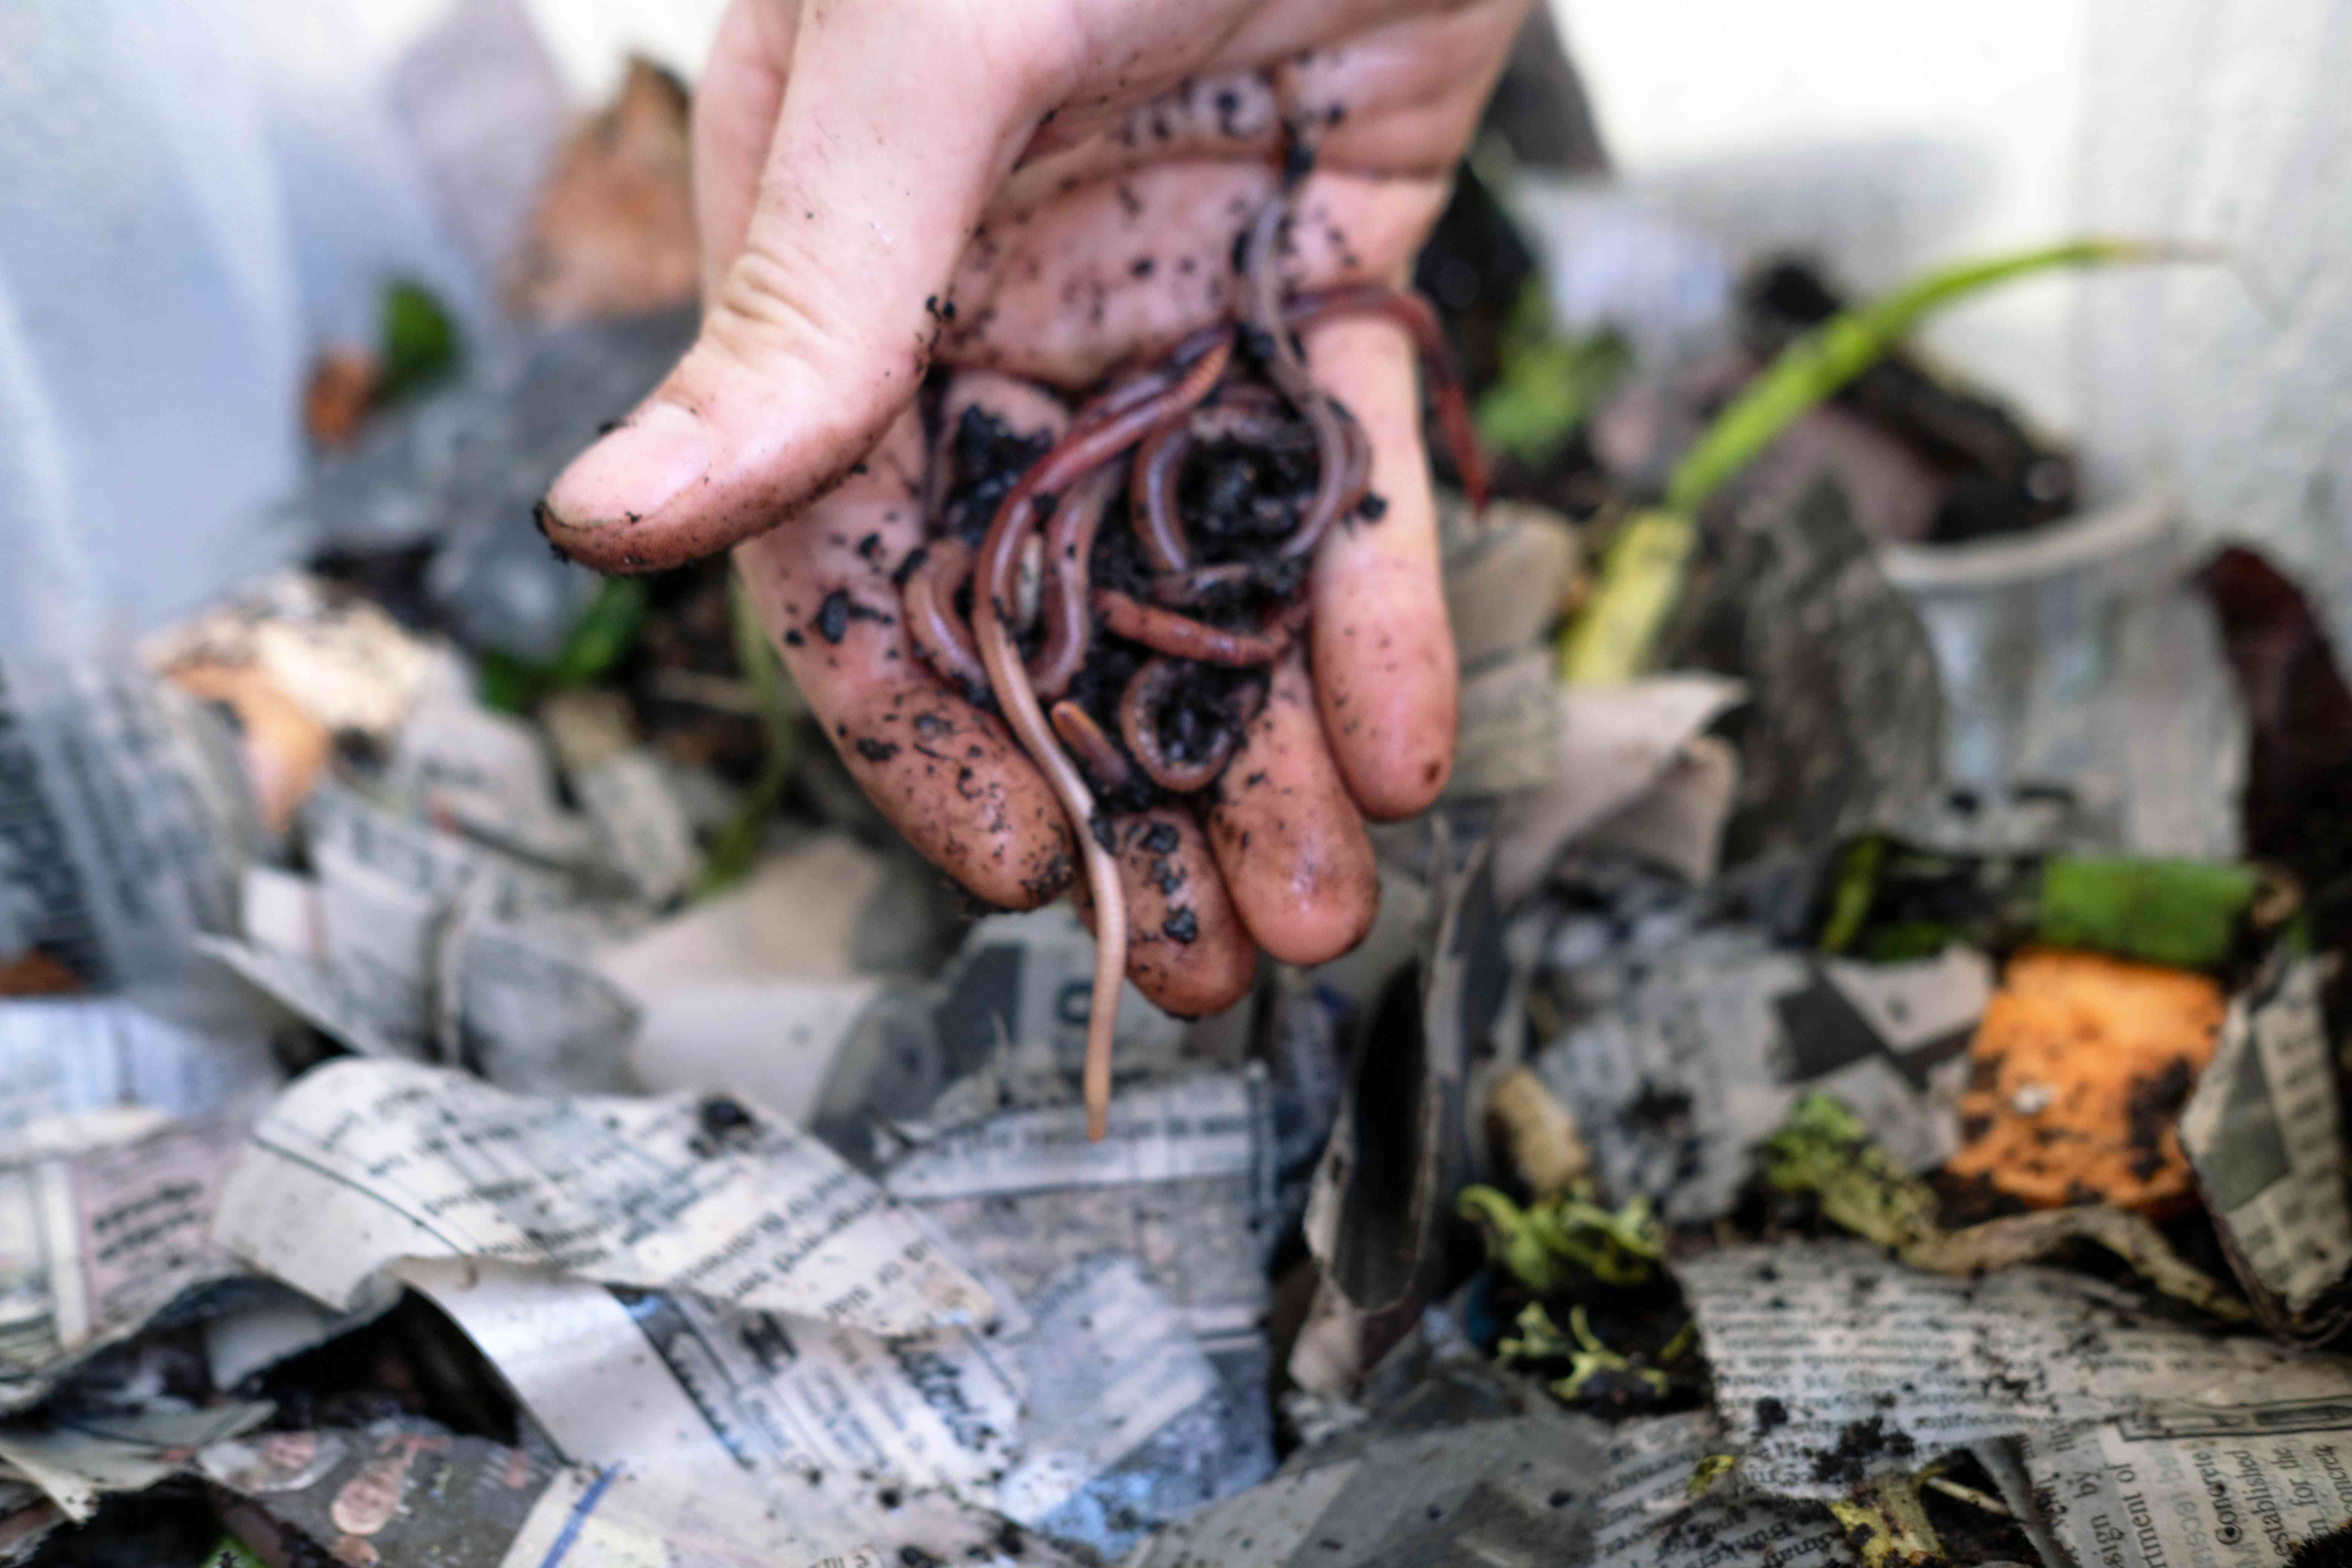 hands drop red wiggler worms into vermicomposting bin with food scraps